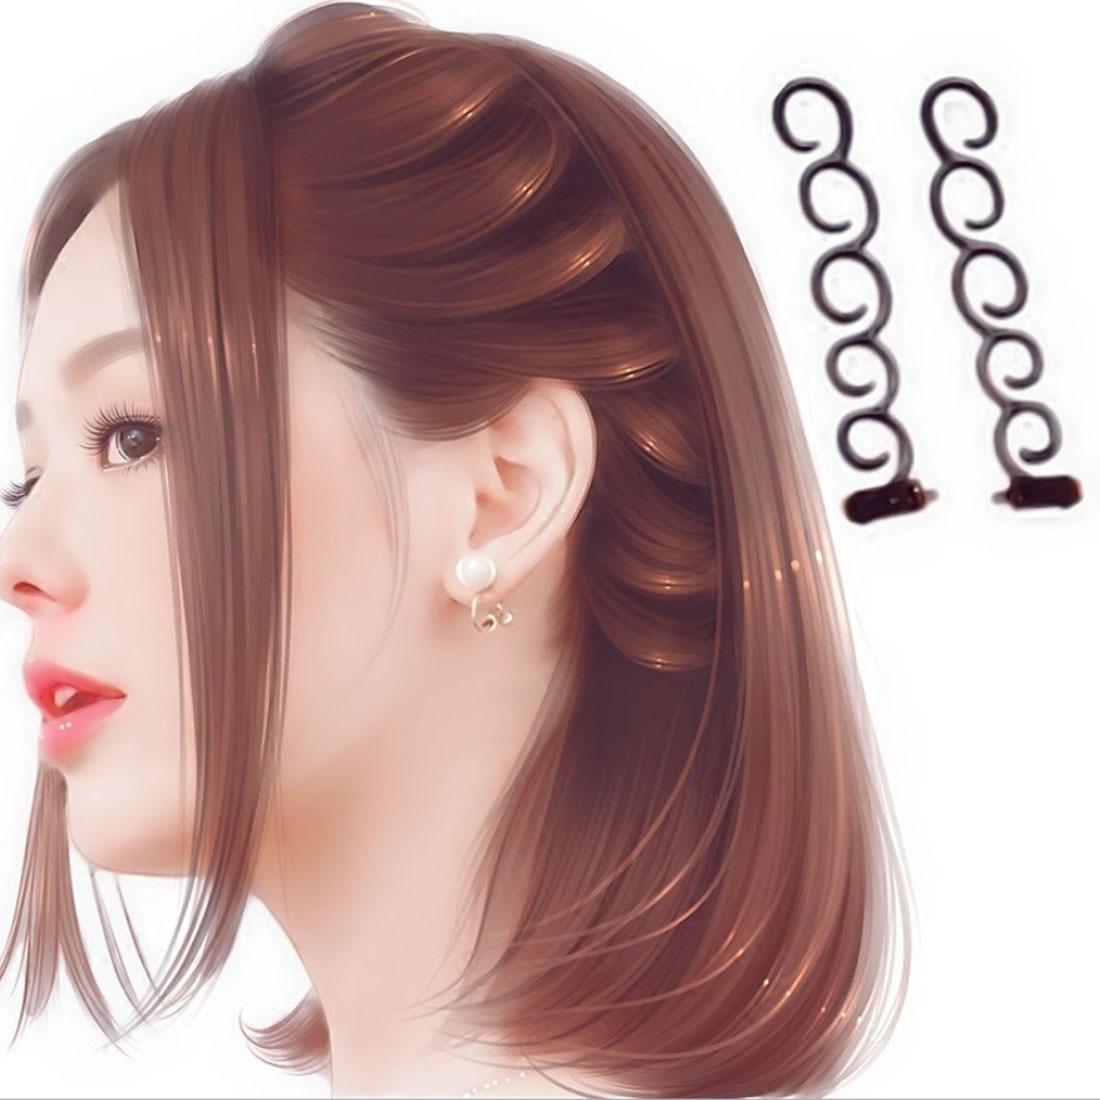 French Elegance Hair Braider Flower Magic Hair Clip Stylist Queue Twist Plait DIY Hairstyle Styling Accessories Random Colors